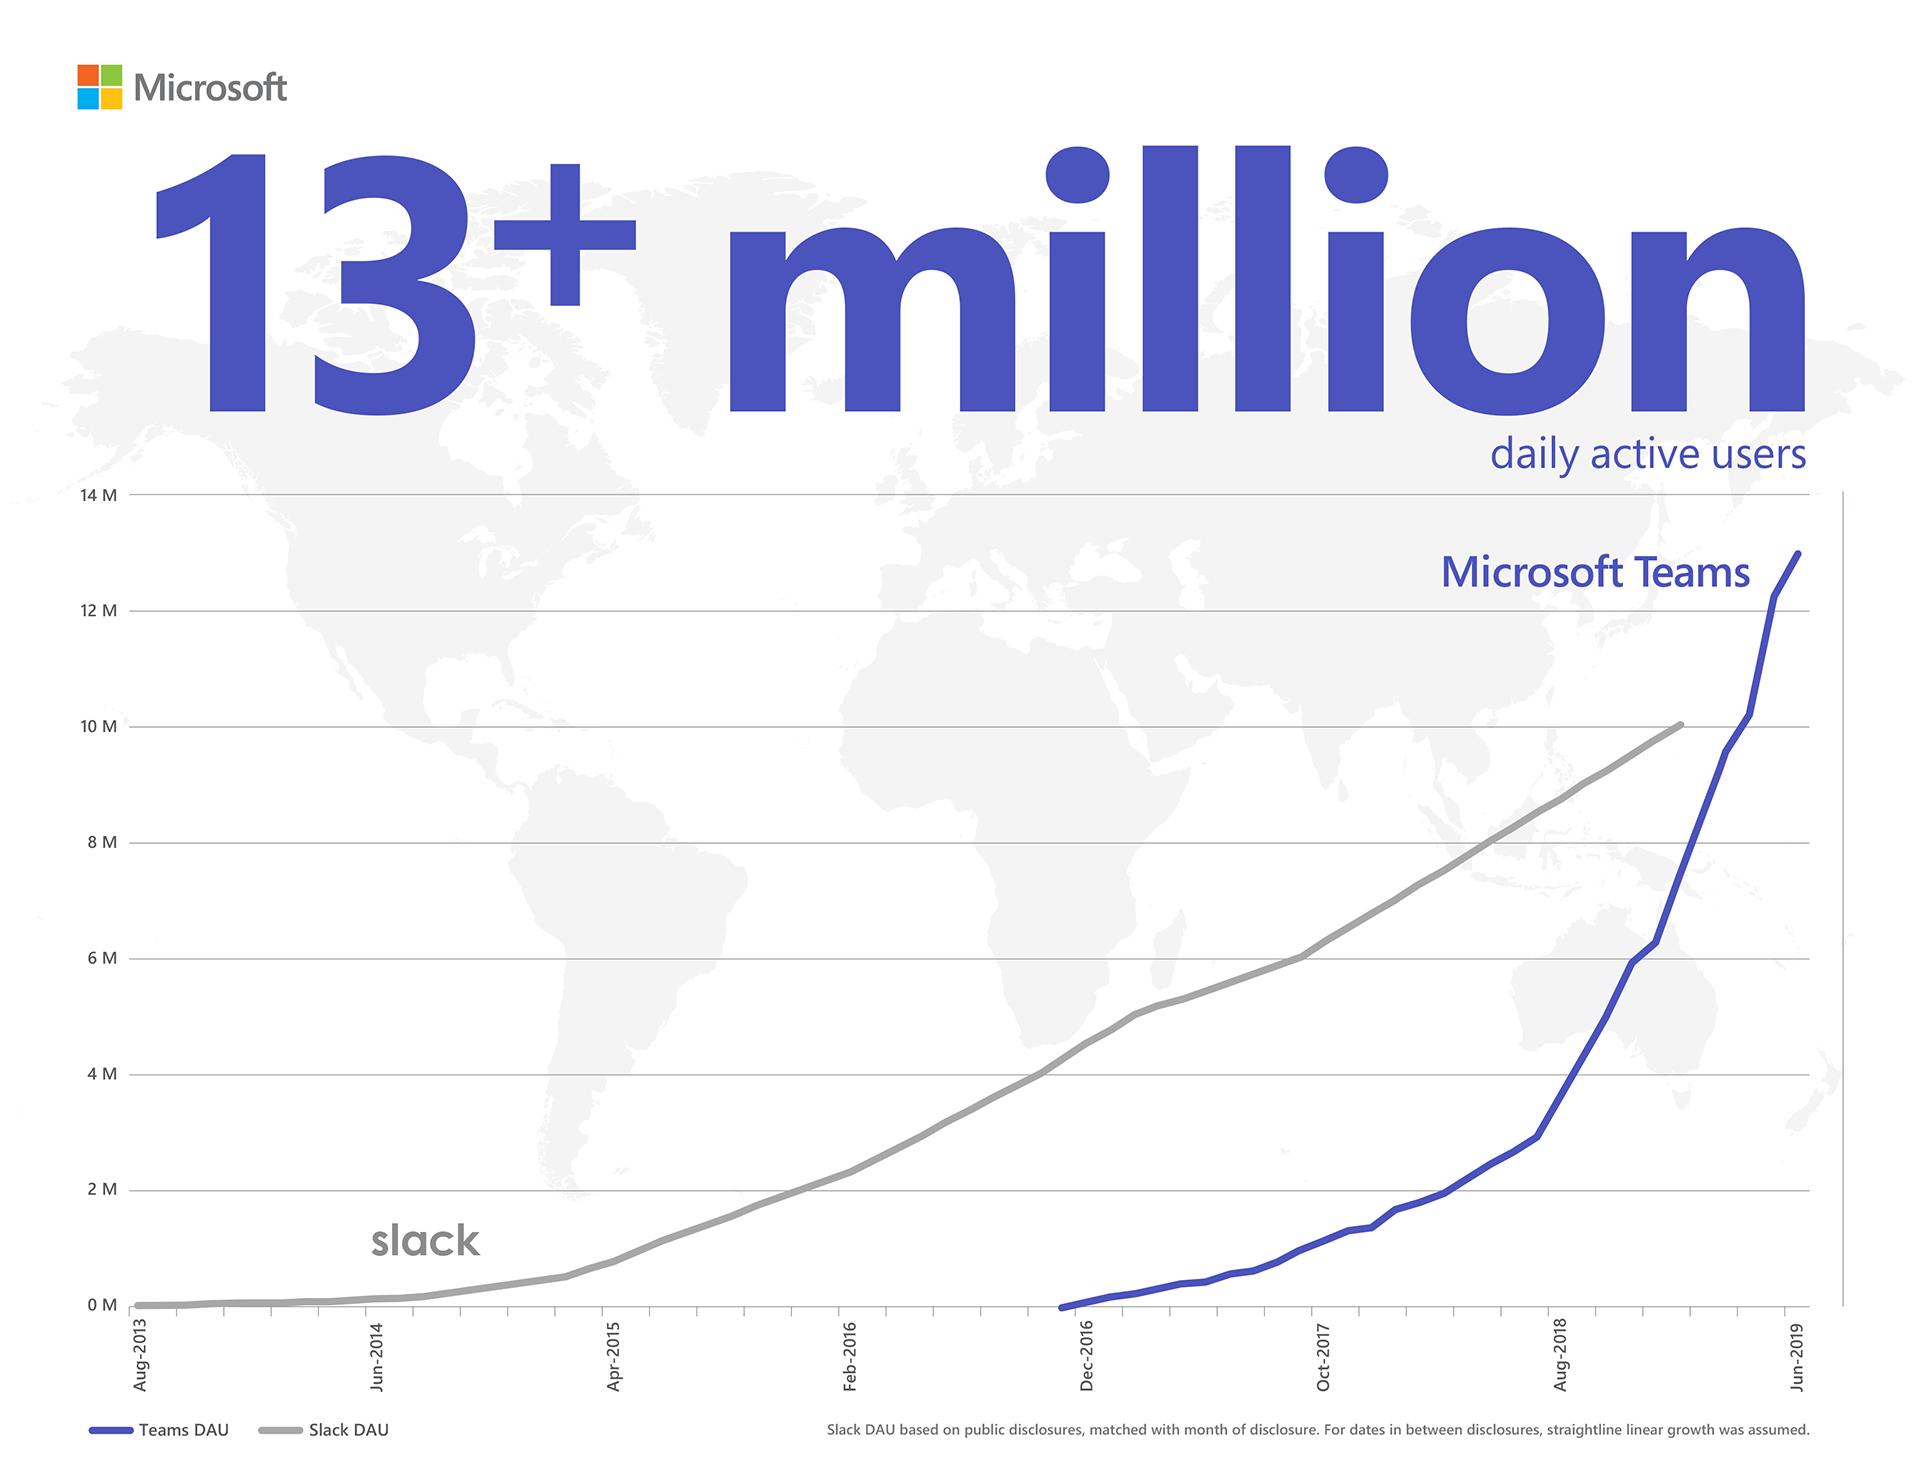 Microsoft Teams has more users than Slack